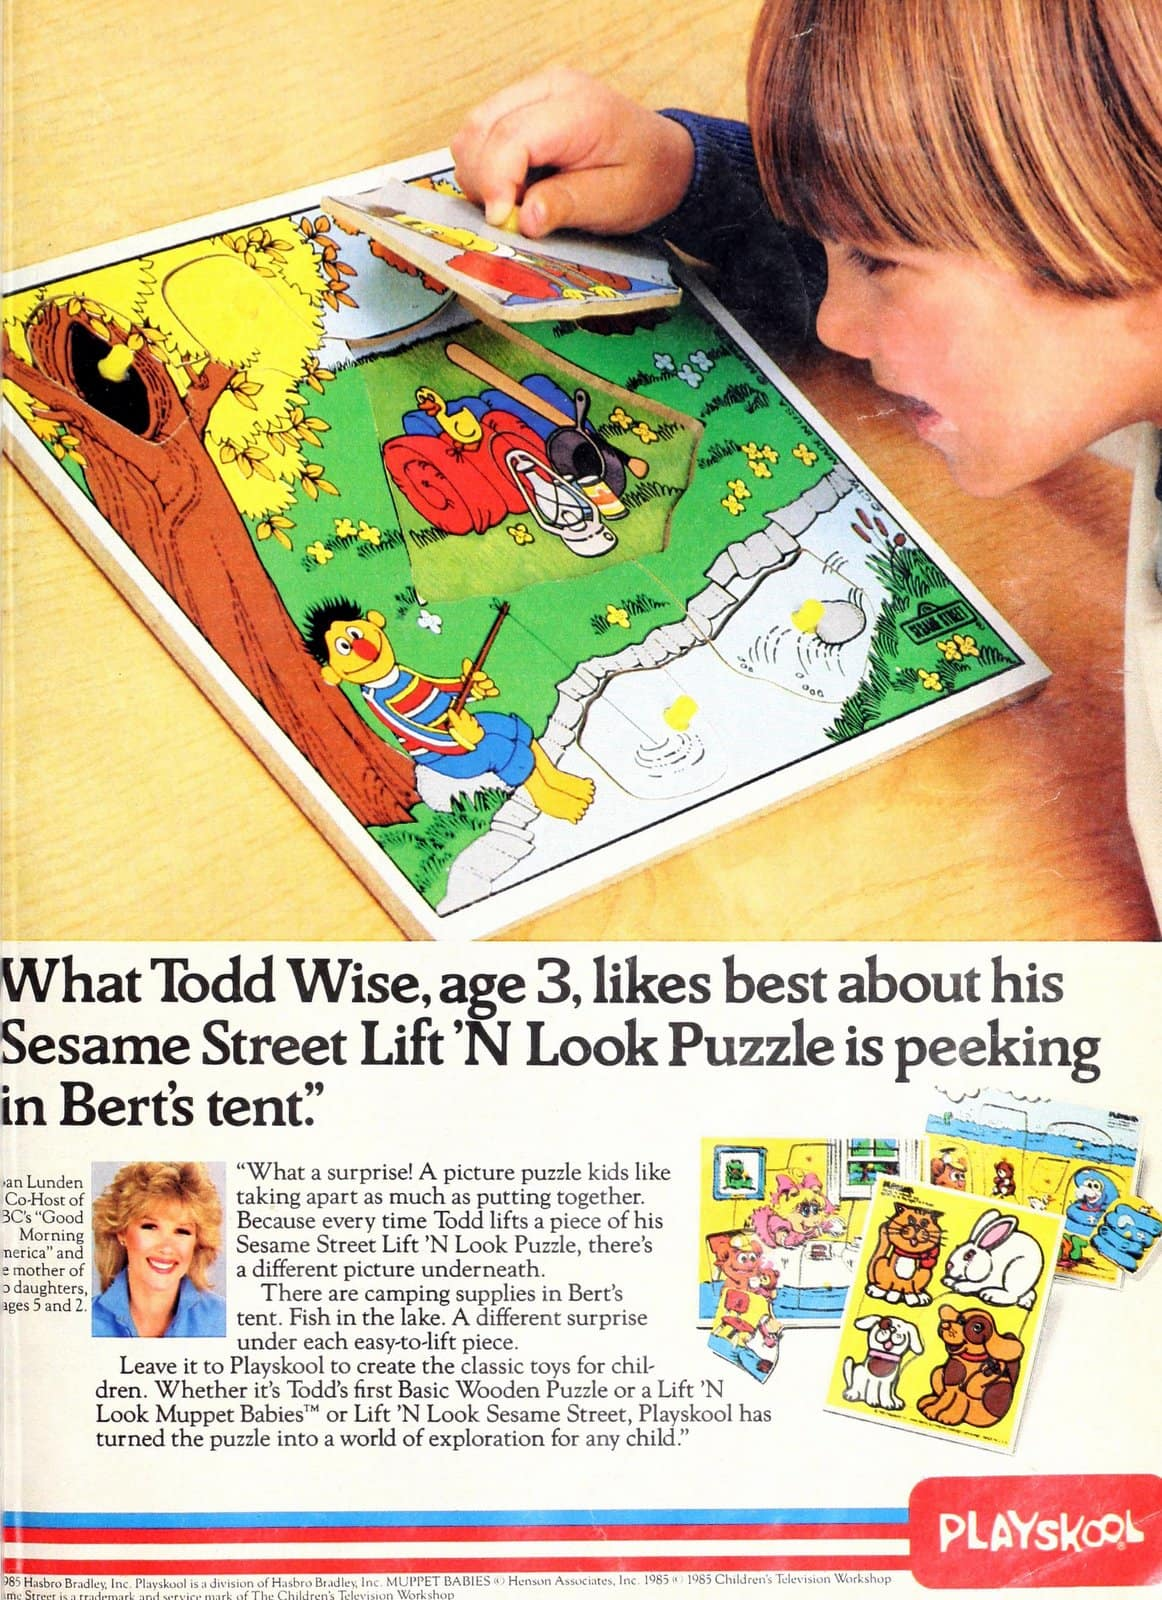 Retro 80s Playskool Sesame Street Lift N Look Puzzle (1985)